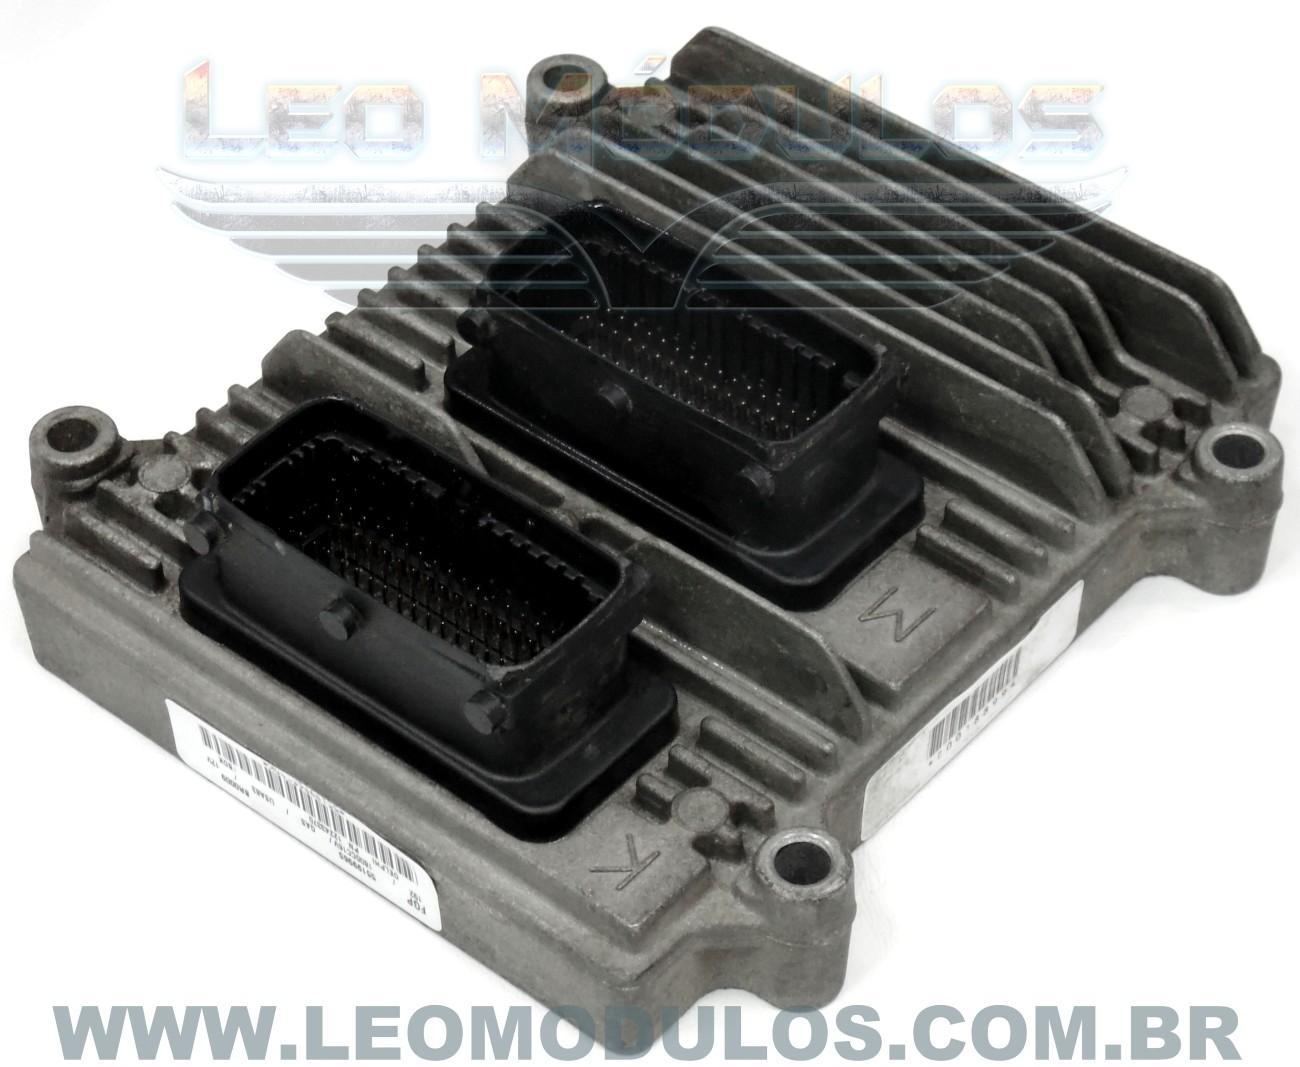 Módulo de injeção multec HSFI 2.3 - FBDK 55199965 - Fiat Stilo 1.8 16V - FBDK - Leo Módulos